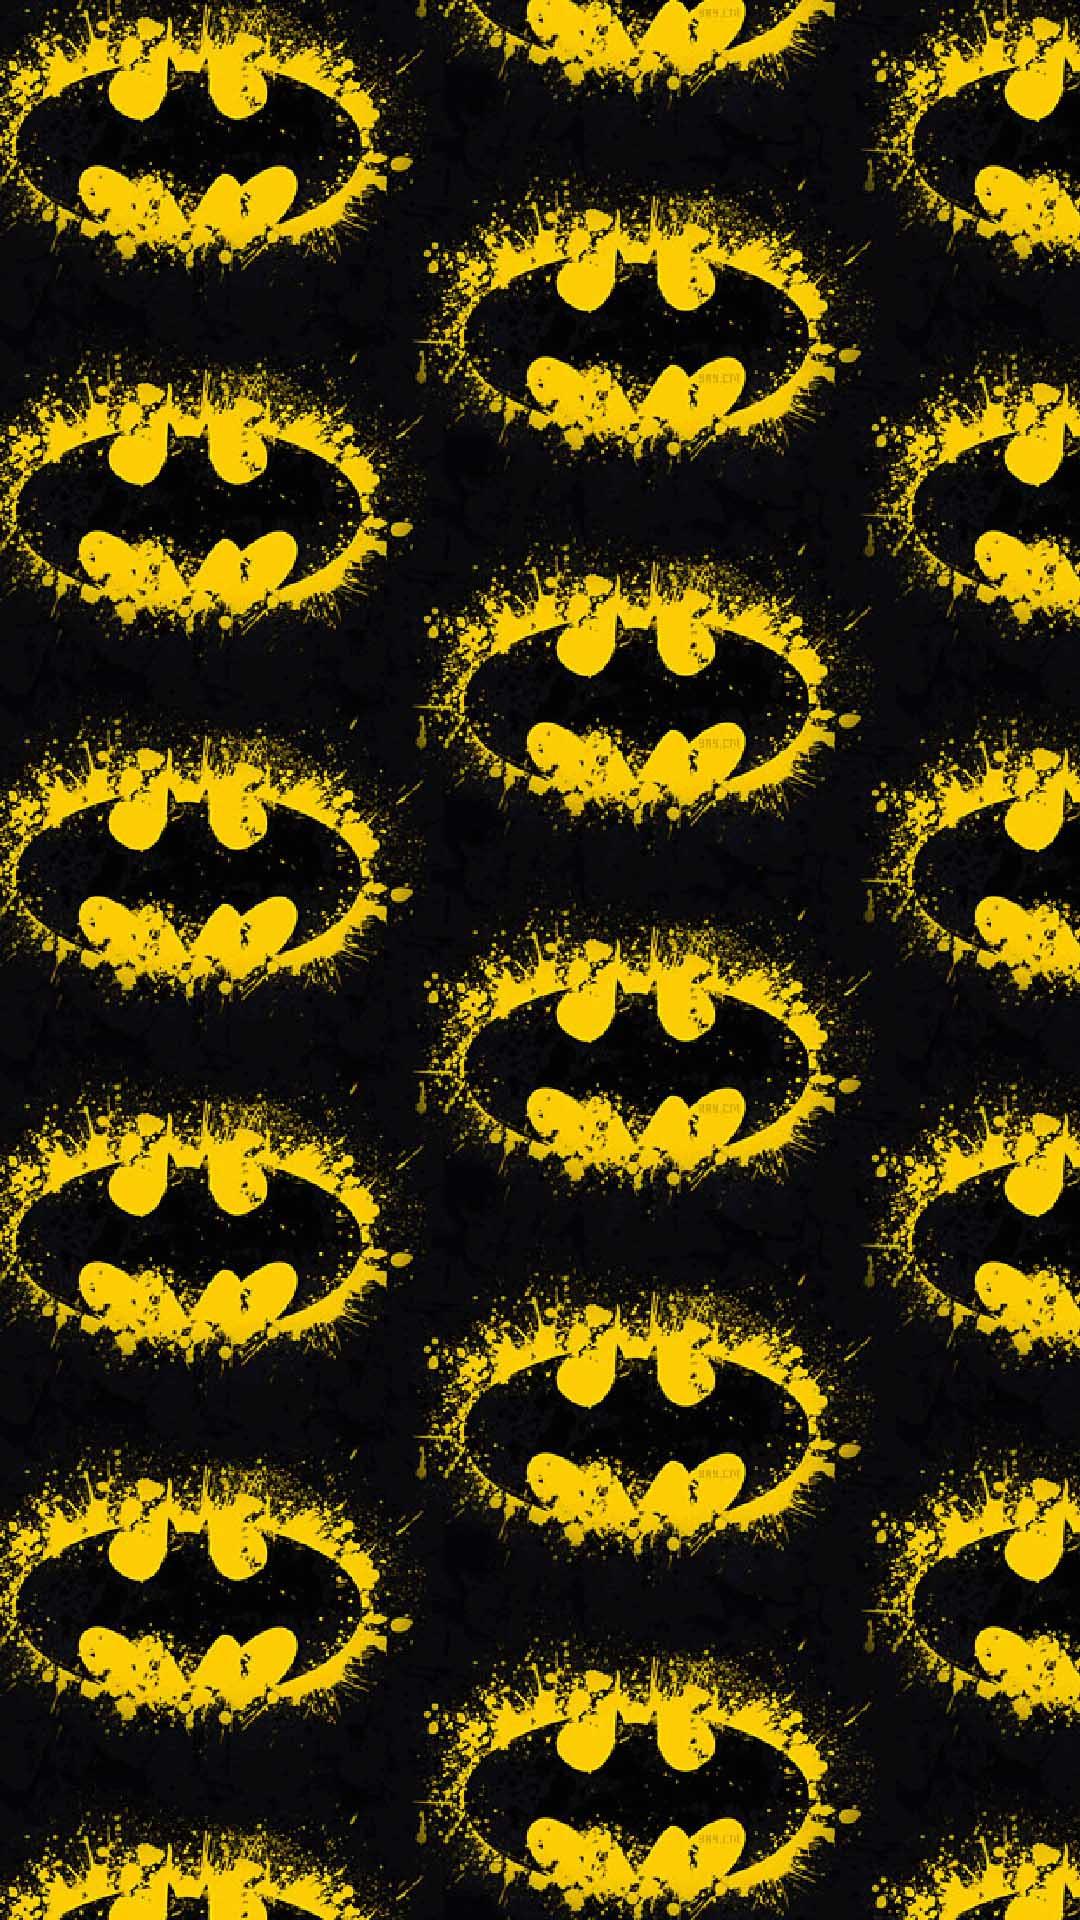 iPhone wallpaper batman logo Batman